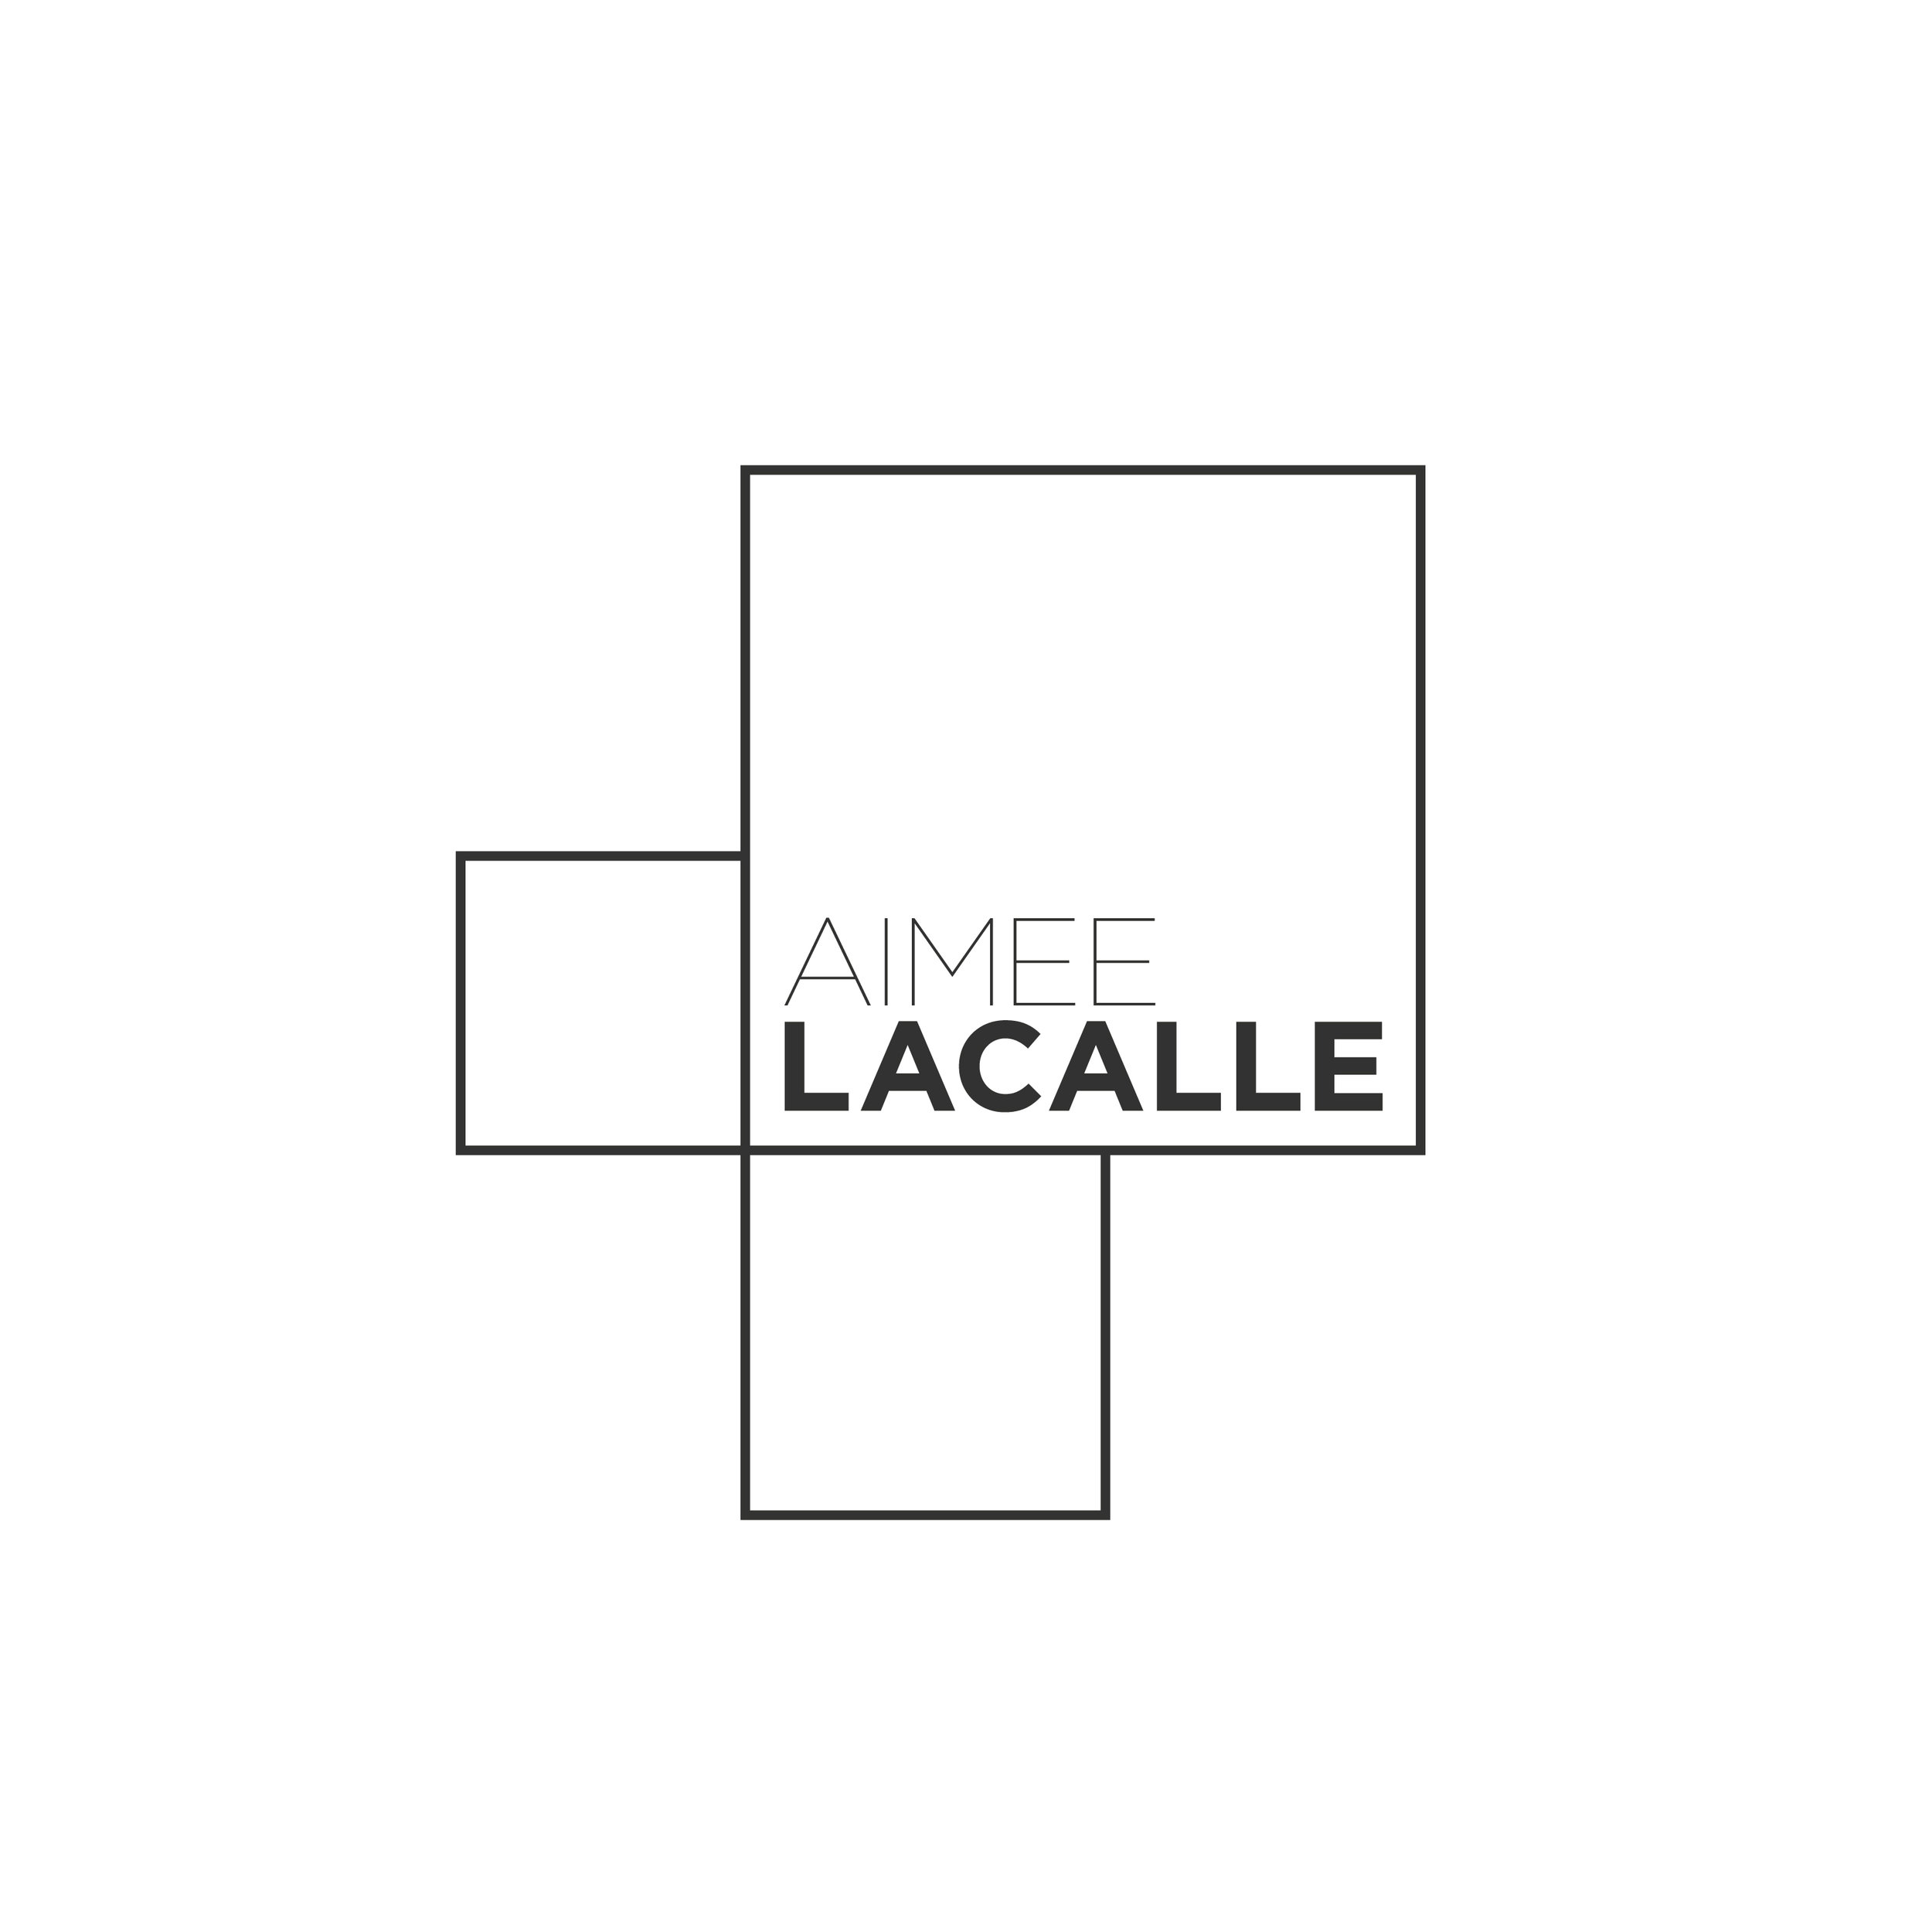 CM_aimeelacalle_Final_Brand Specific Logo-02.jpg